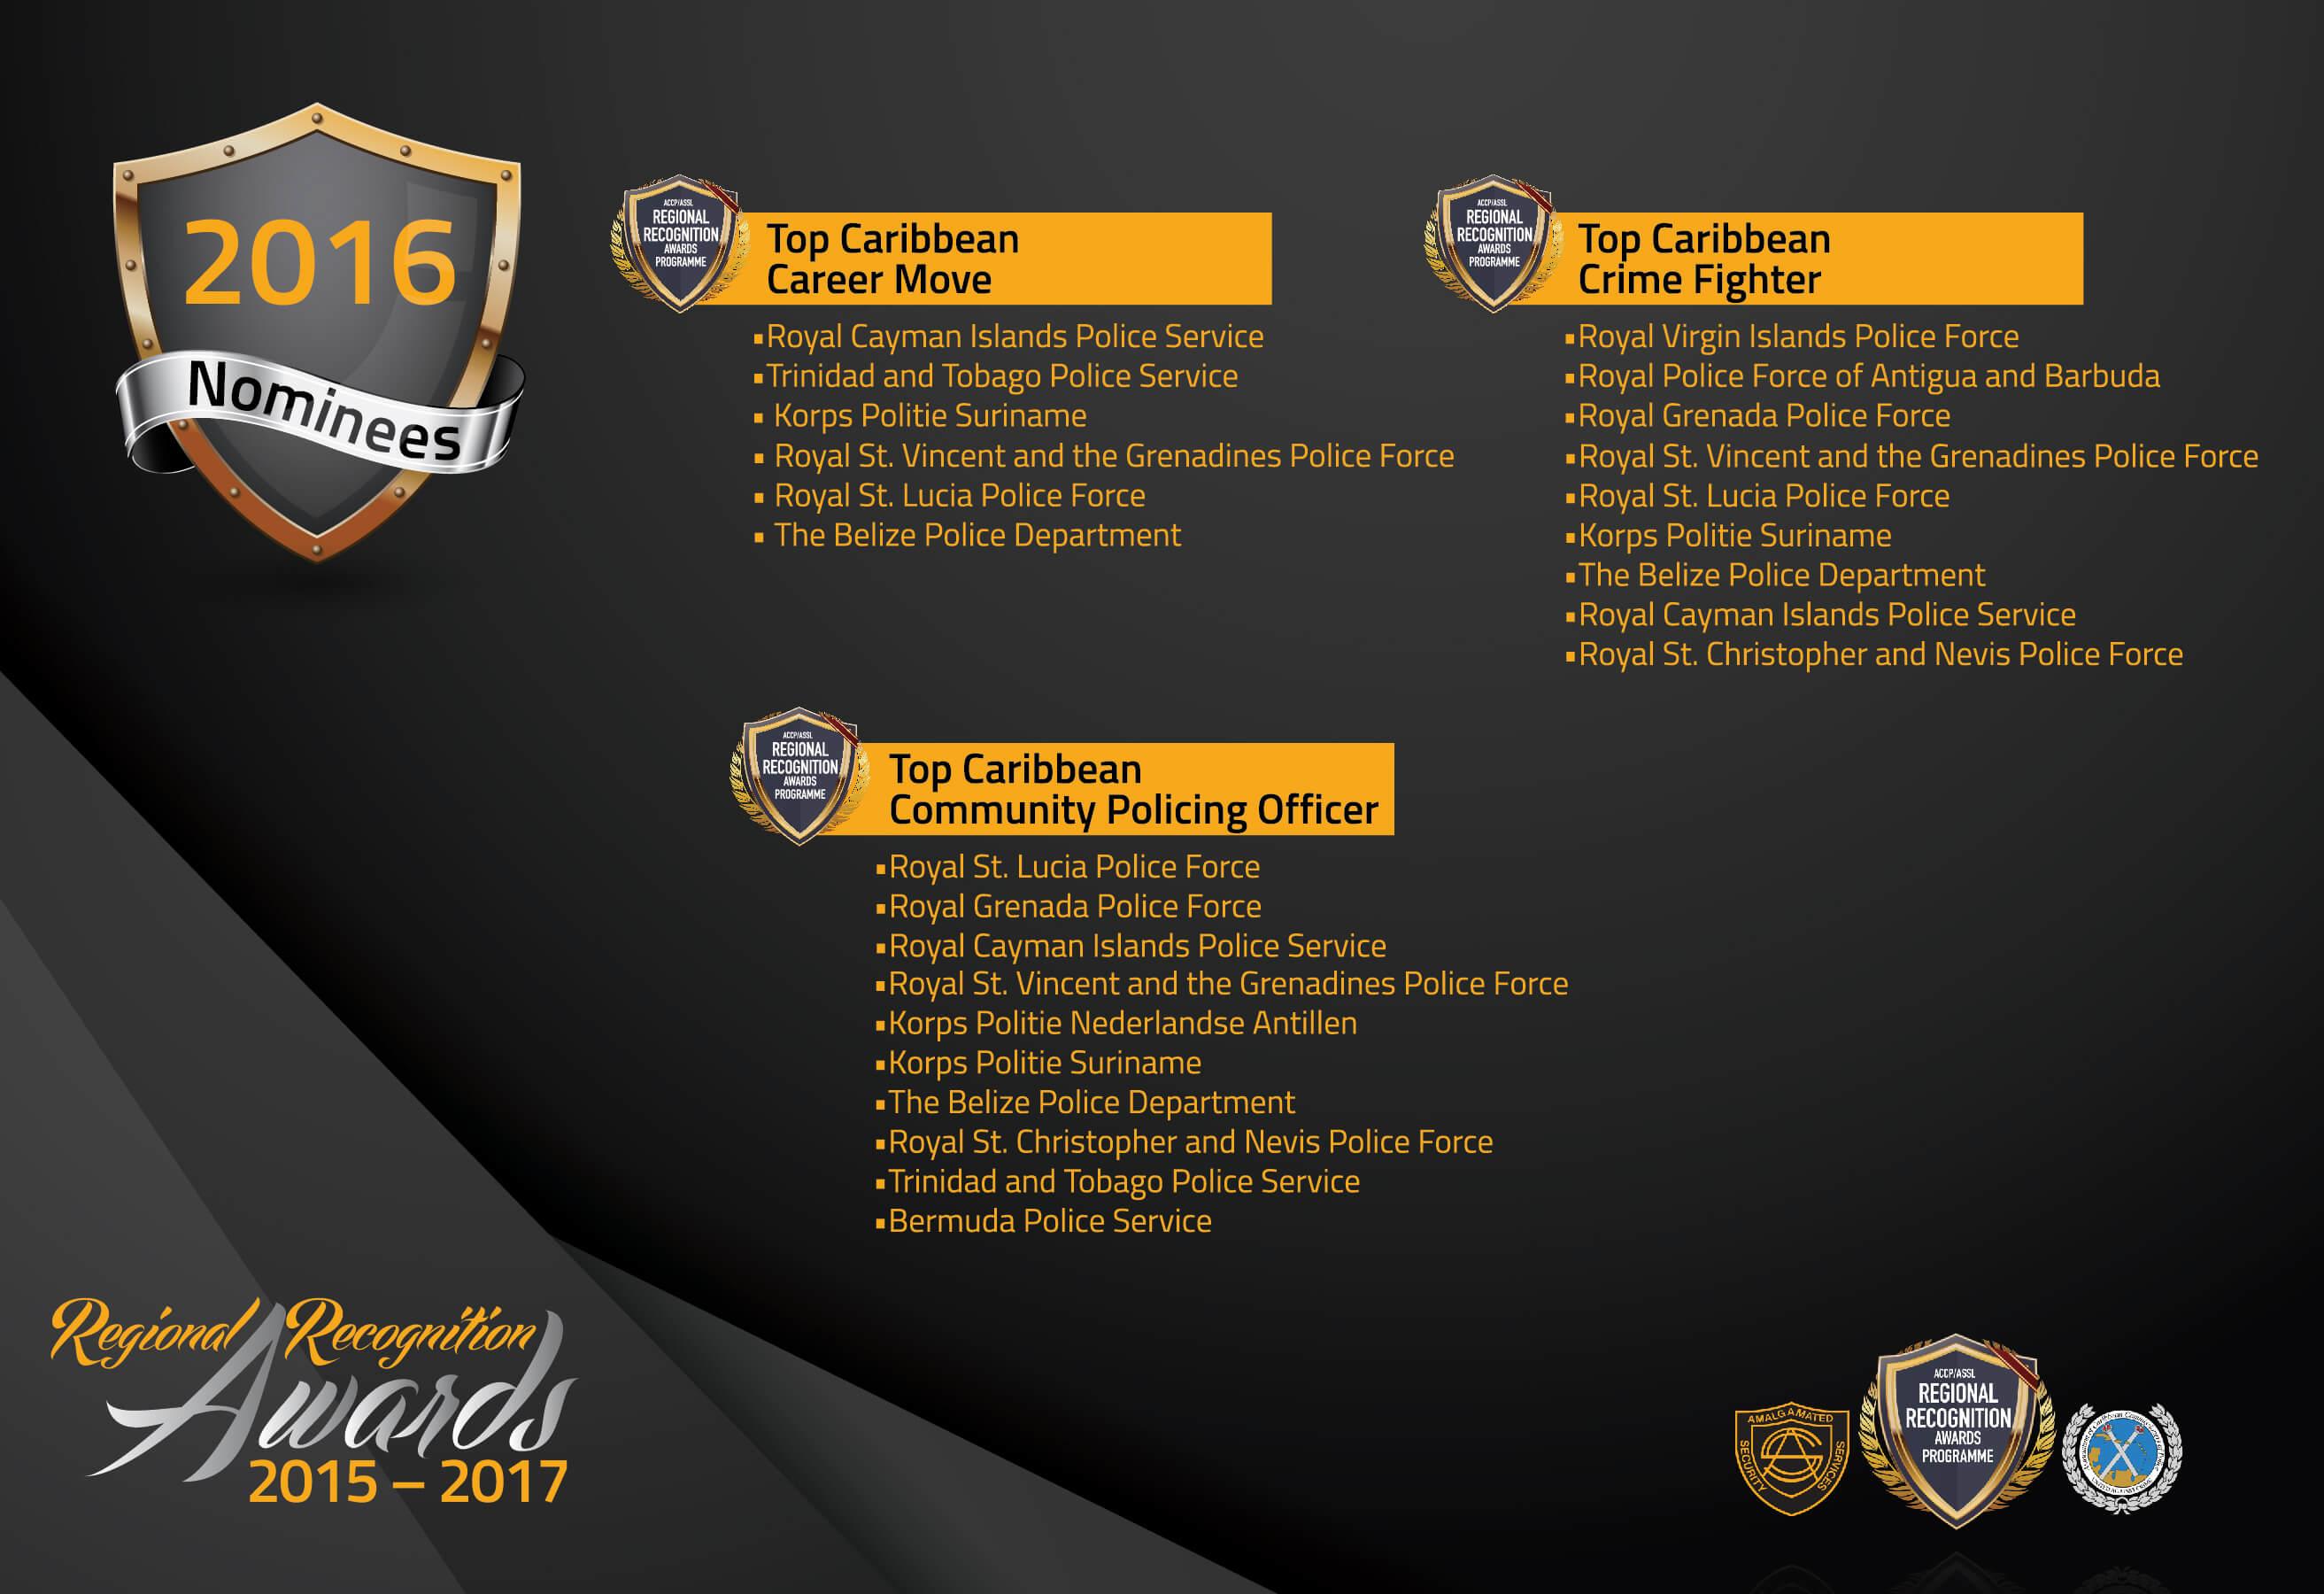 2016 Nominees